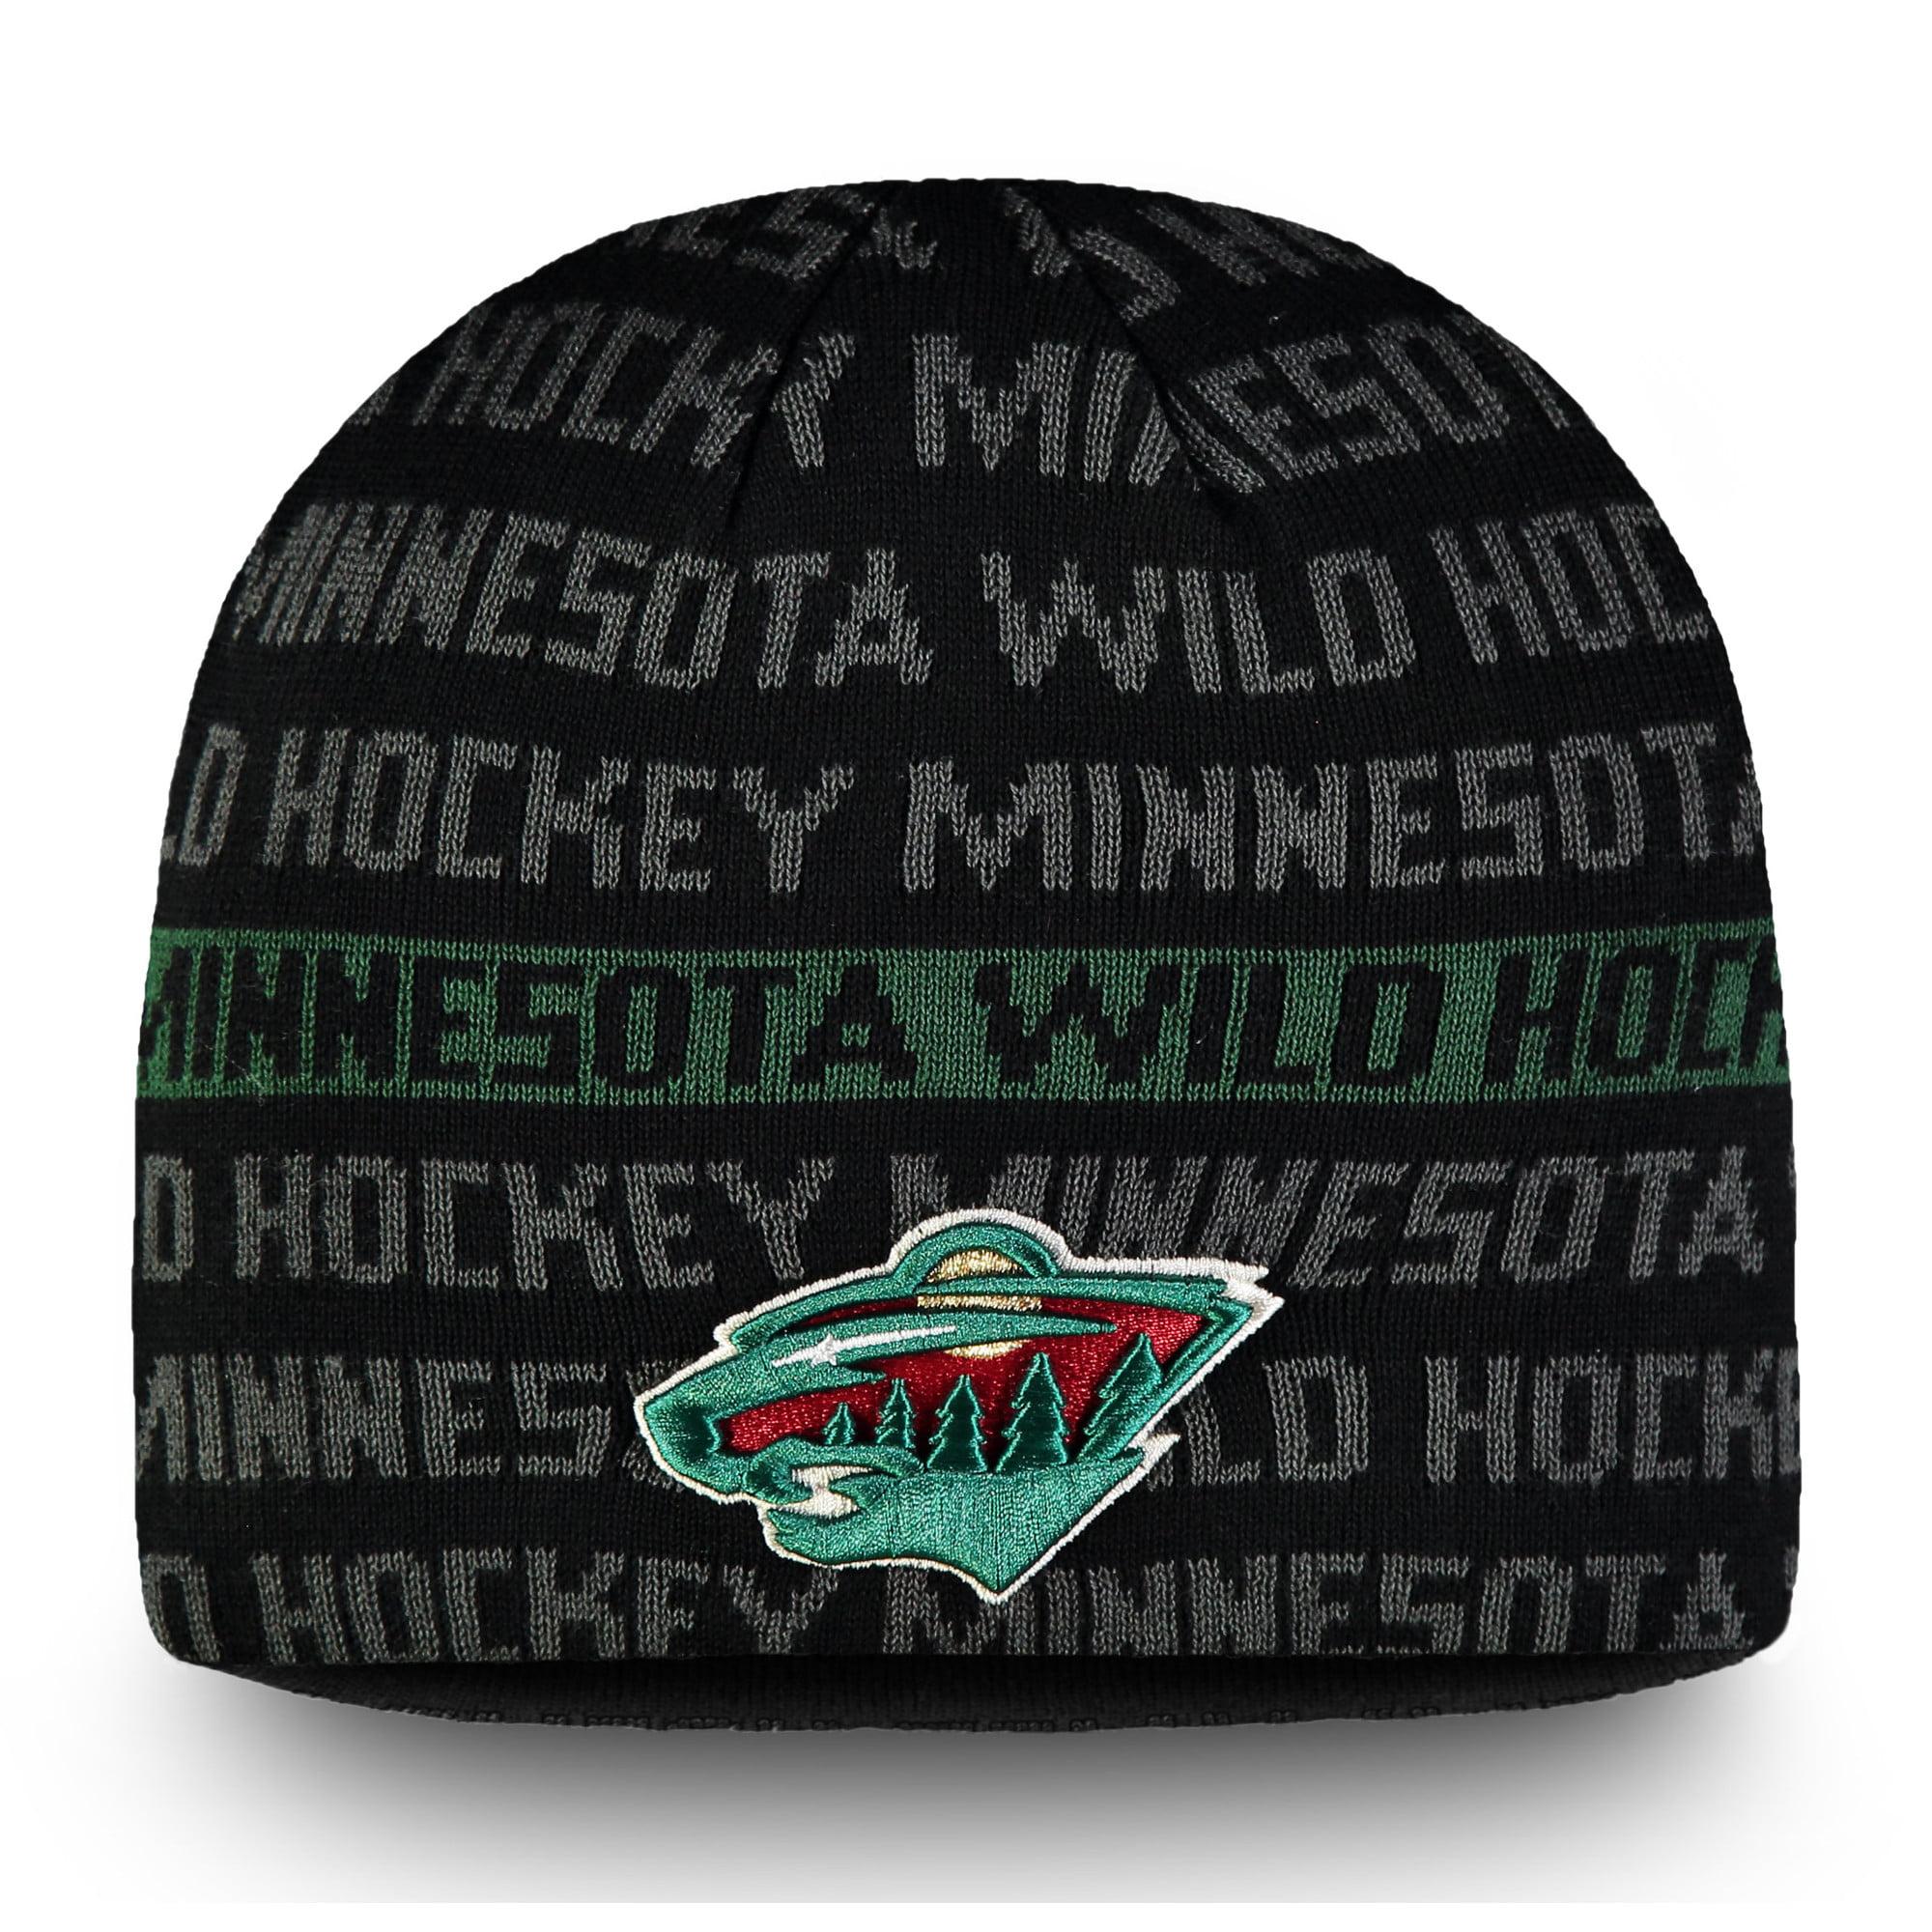 Minnesota Wild Fanatics Branded Authentic Pro Rinkside Knit Beanie - Black/Green - OSFA